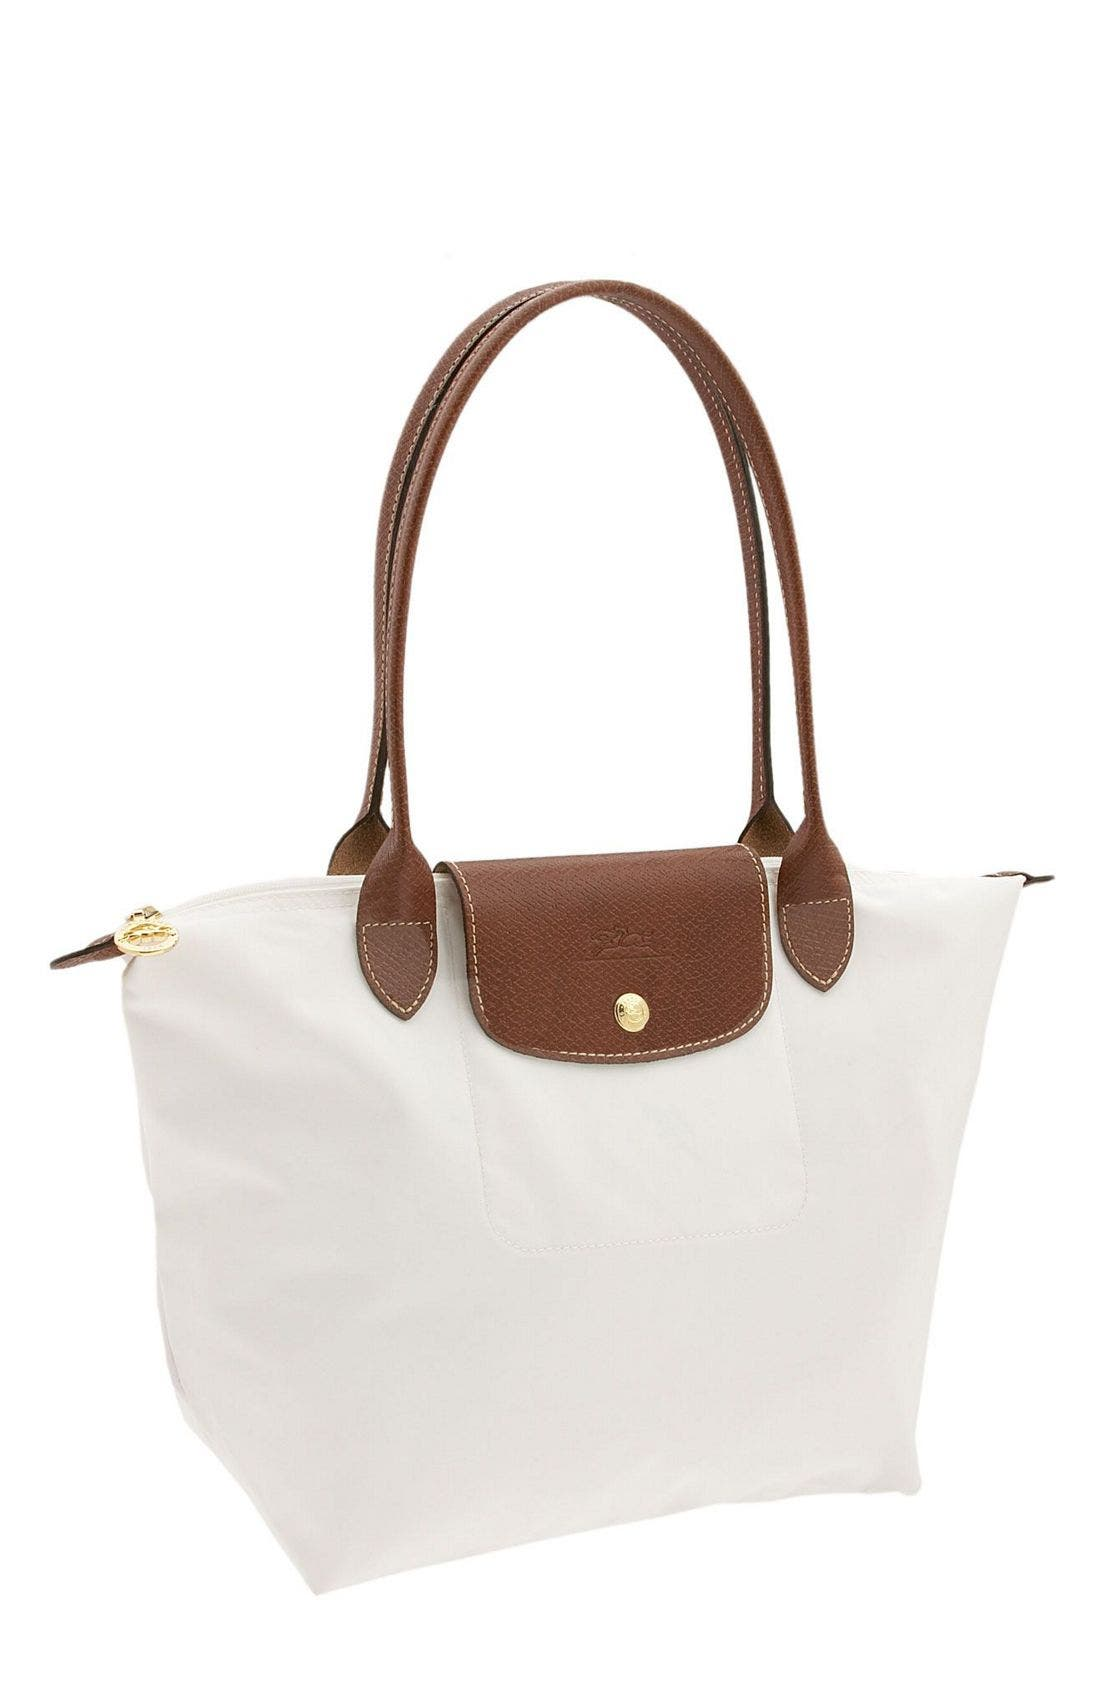 Alternate Image 1 Selected - Longchamp 'Le Pliage - Small' Shoulder Bag